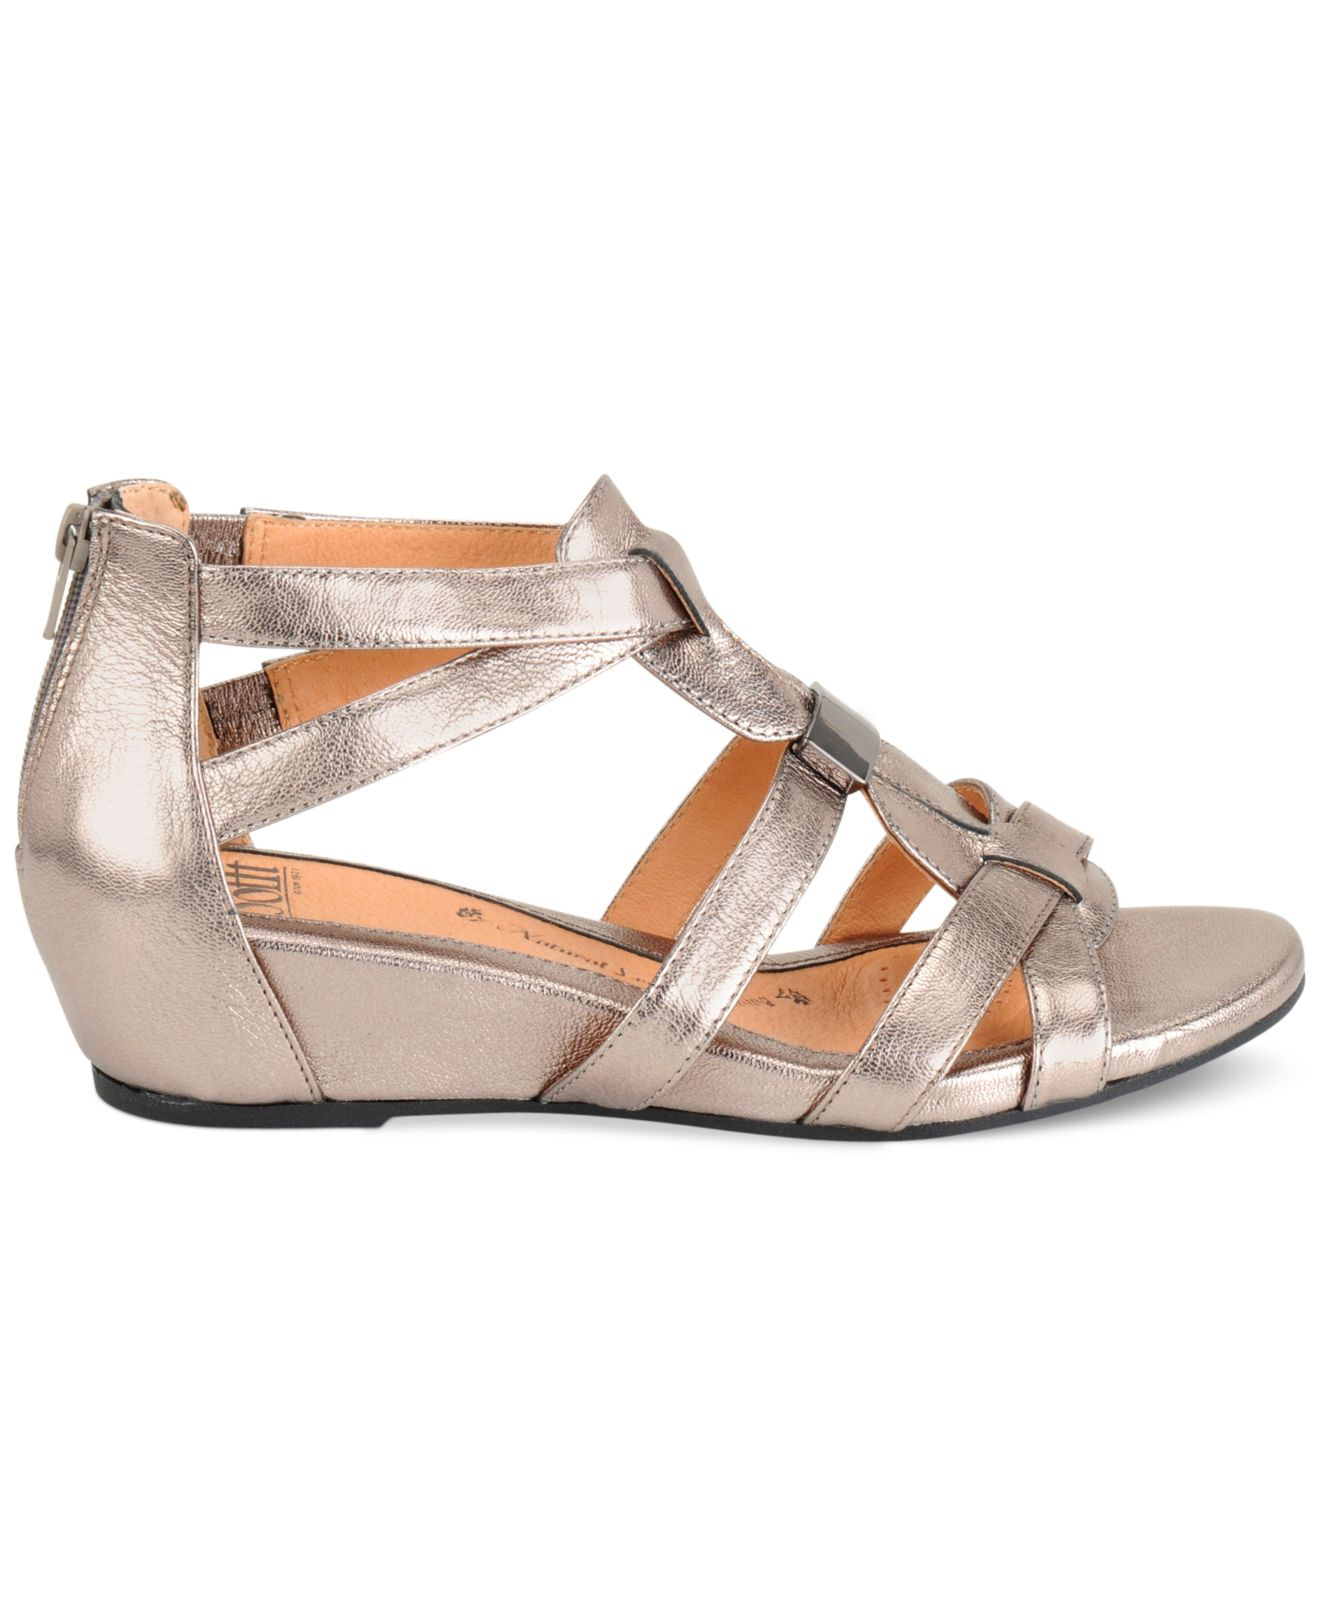 578b273797b Lyst - Söfft Womens Bernia Wedge Sandals in Metallic